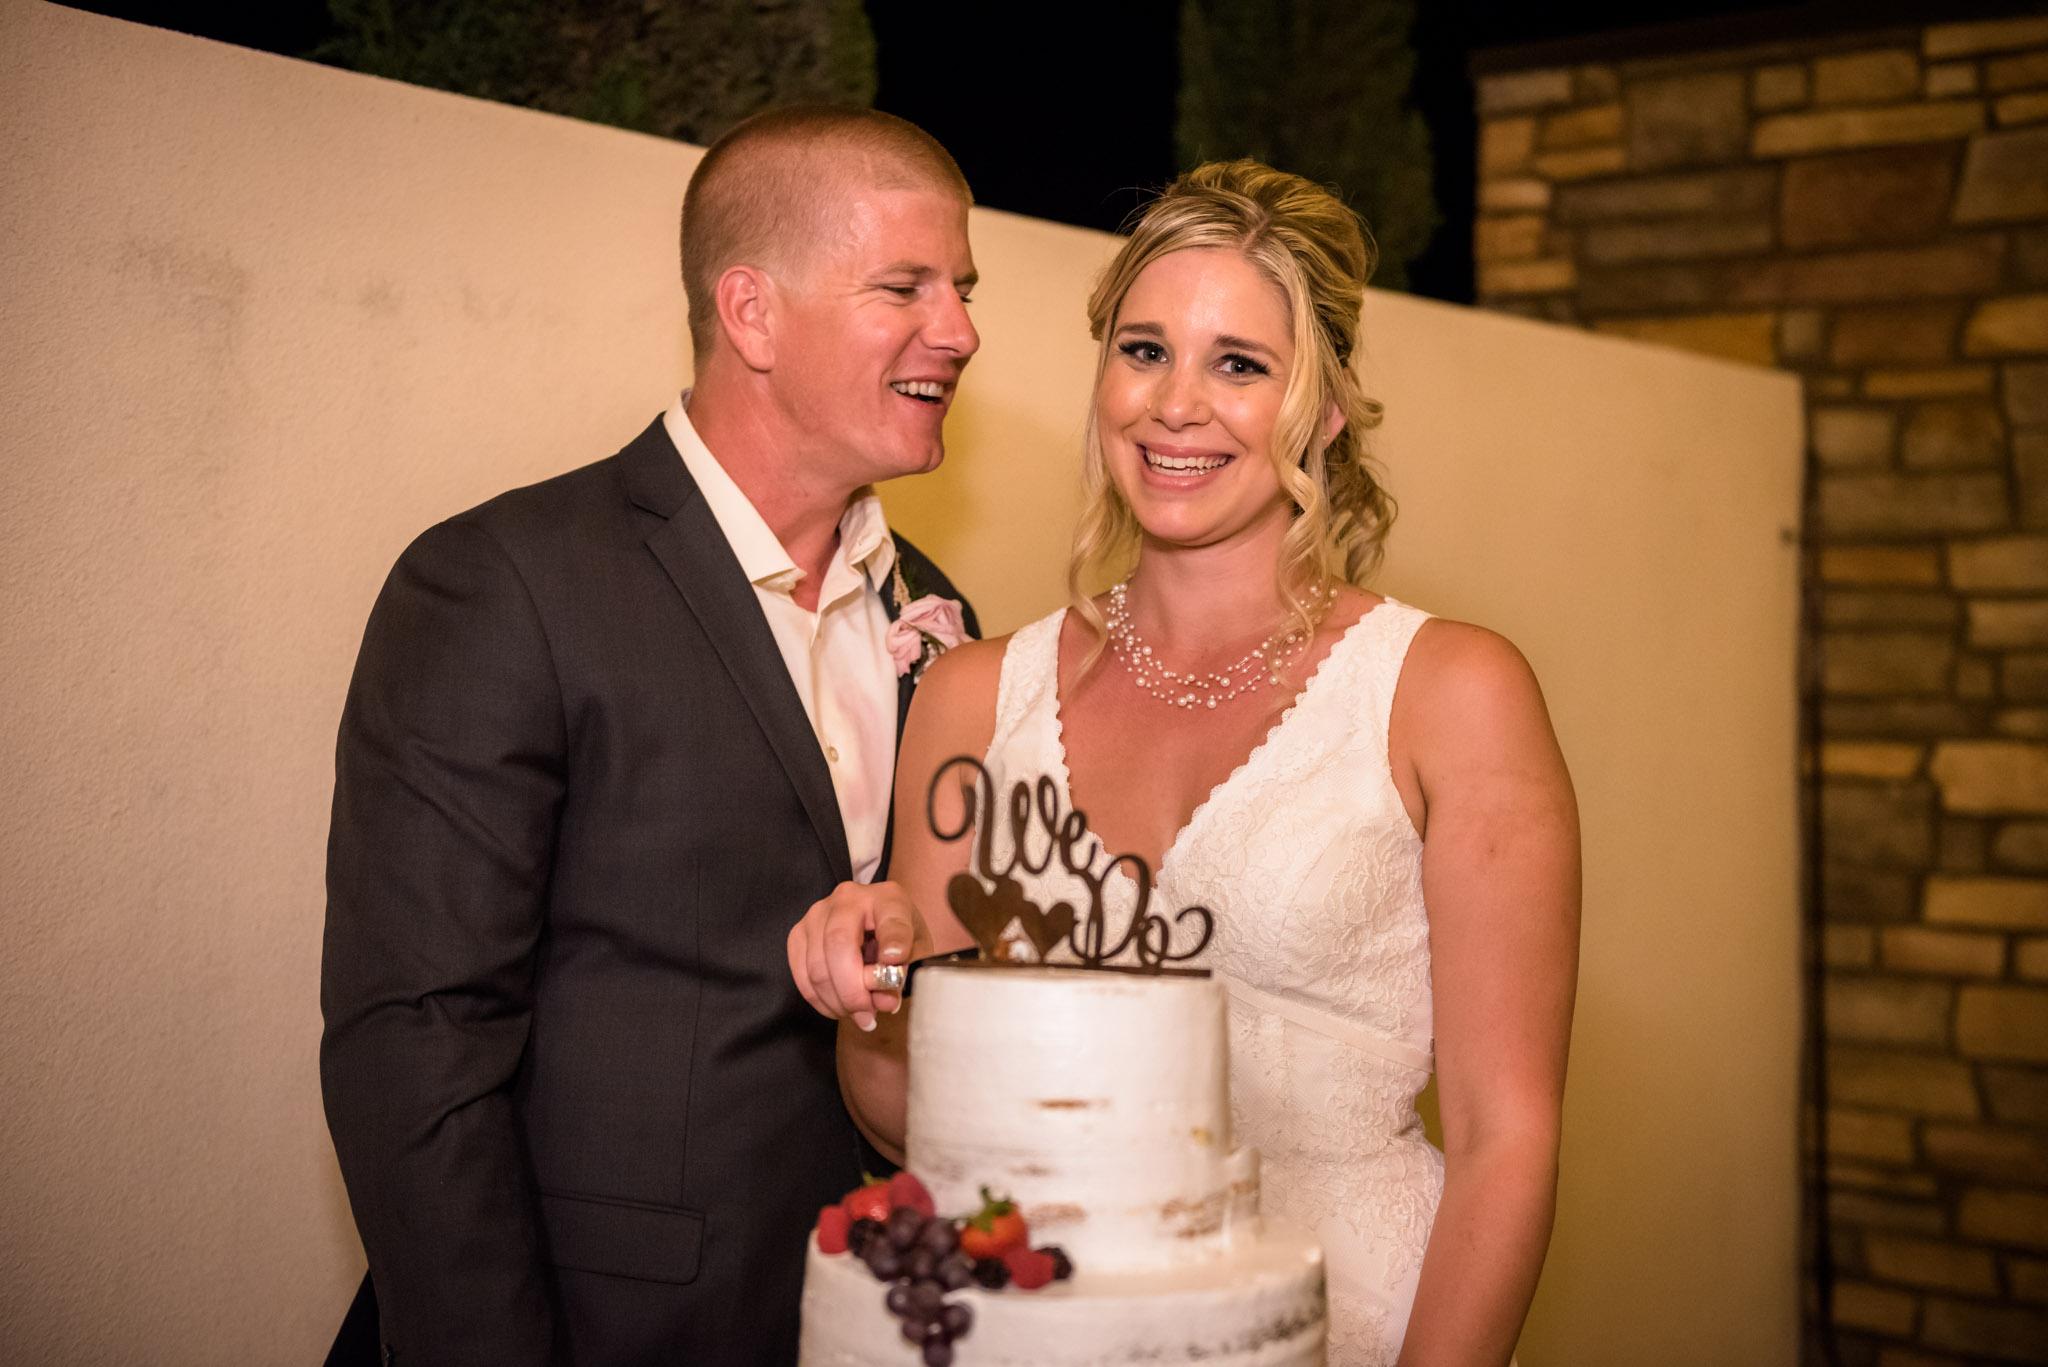 Avensole-Winery-Temecula-Wedding-Josh-and-Olivia-4351.JPG